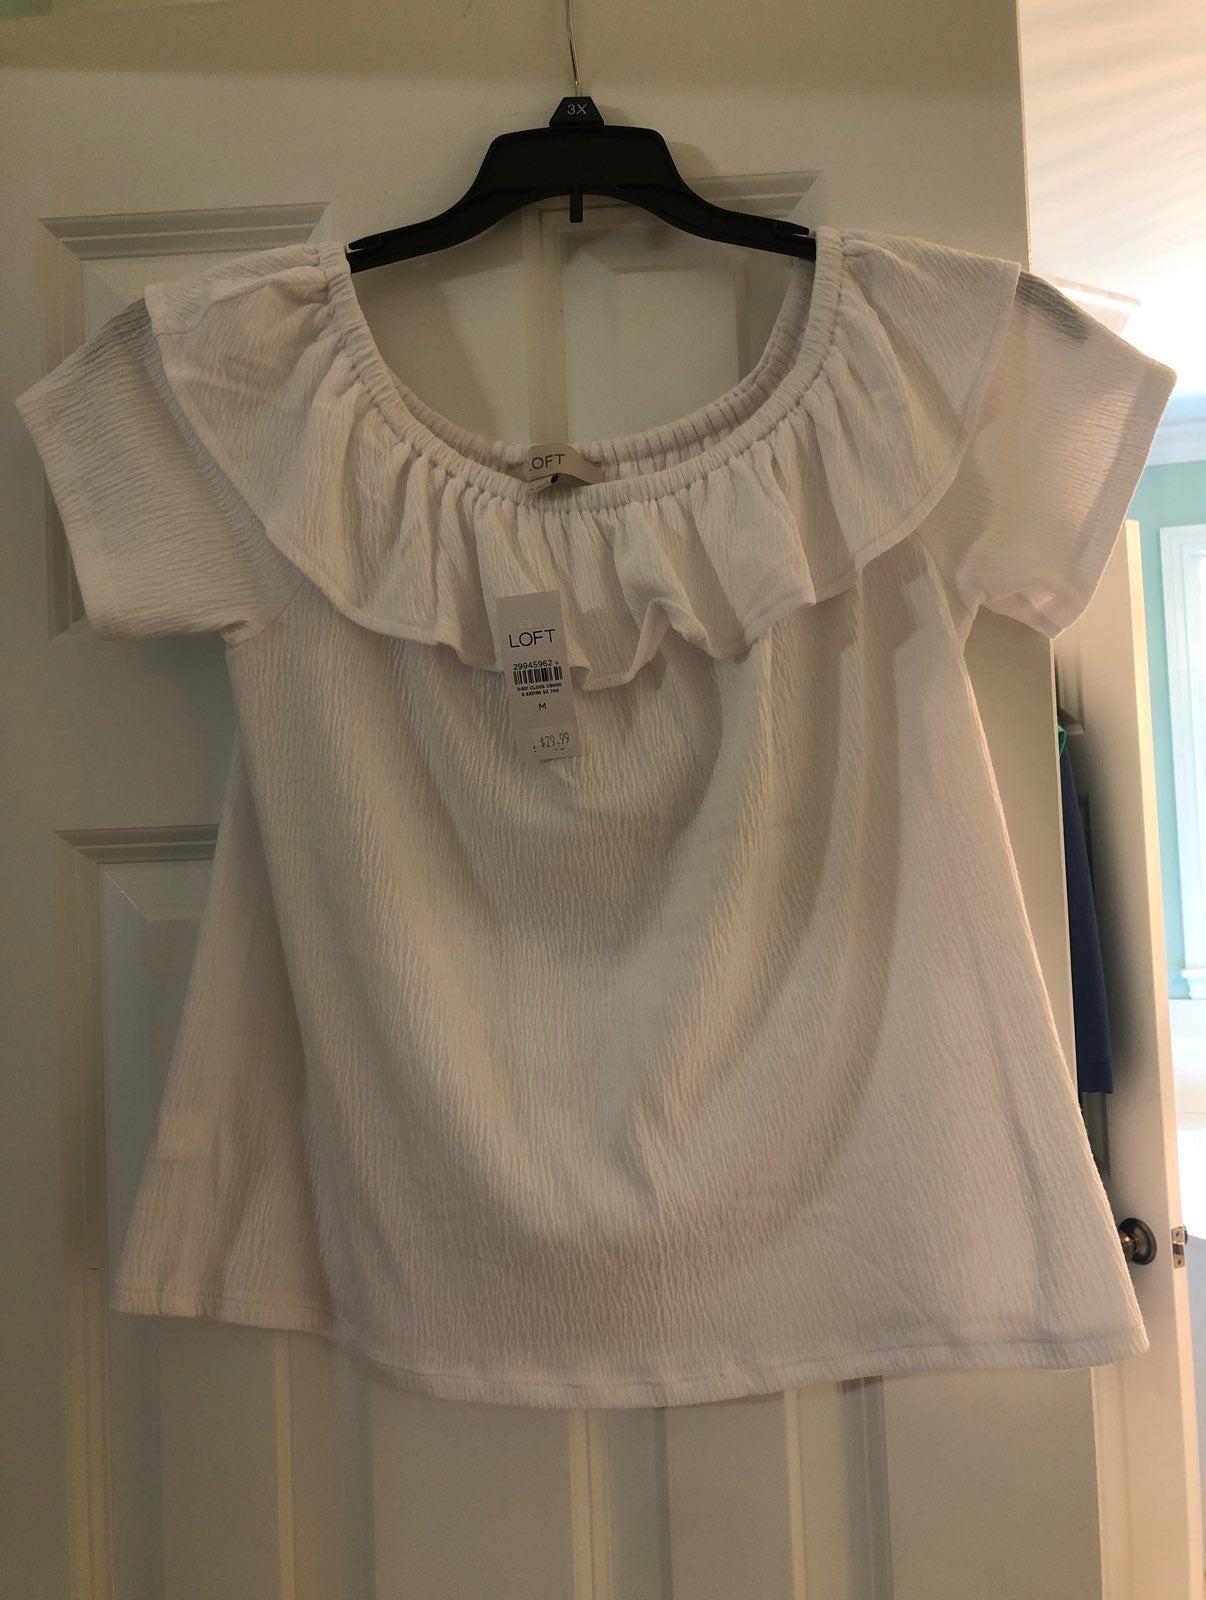 NWT-Set of 2 Anne Taylor Loft Shirts